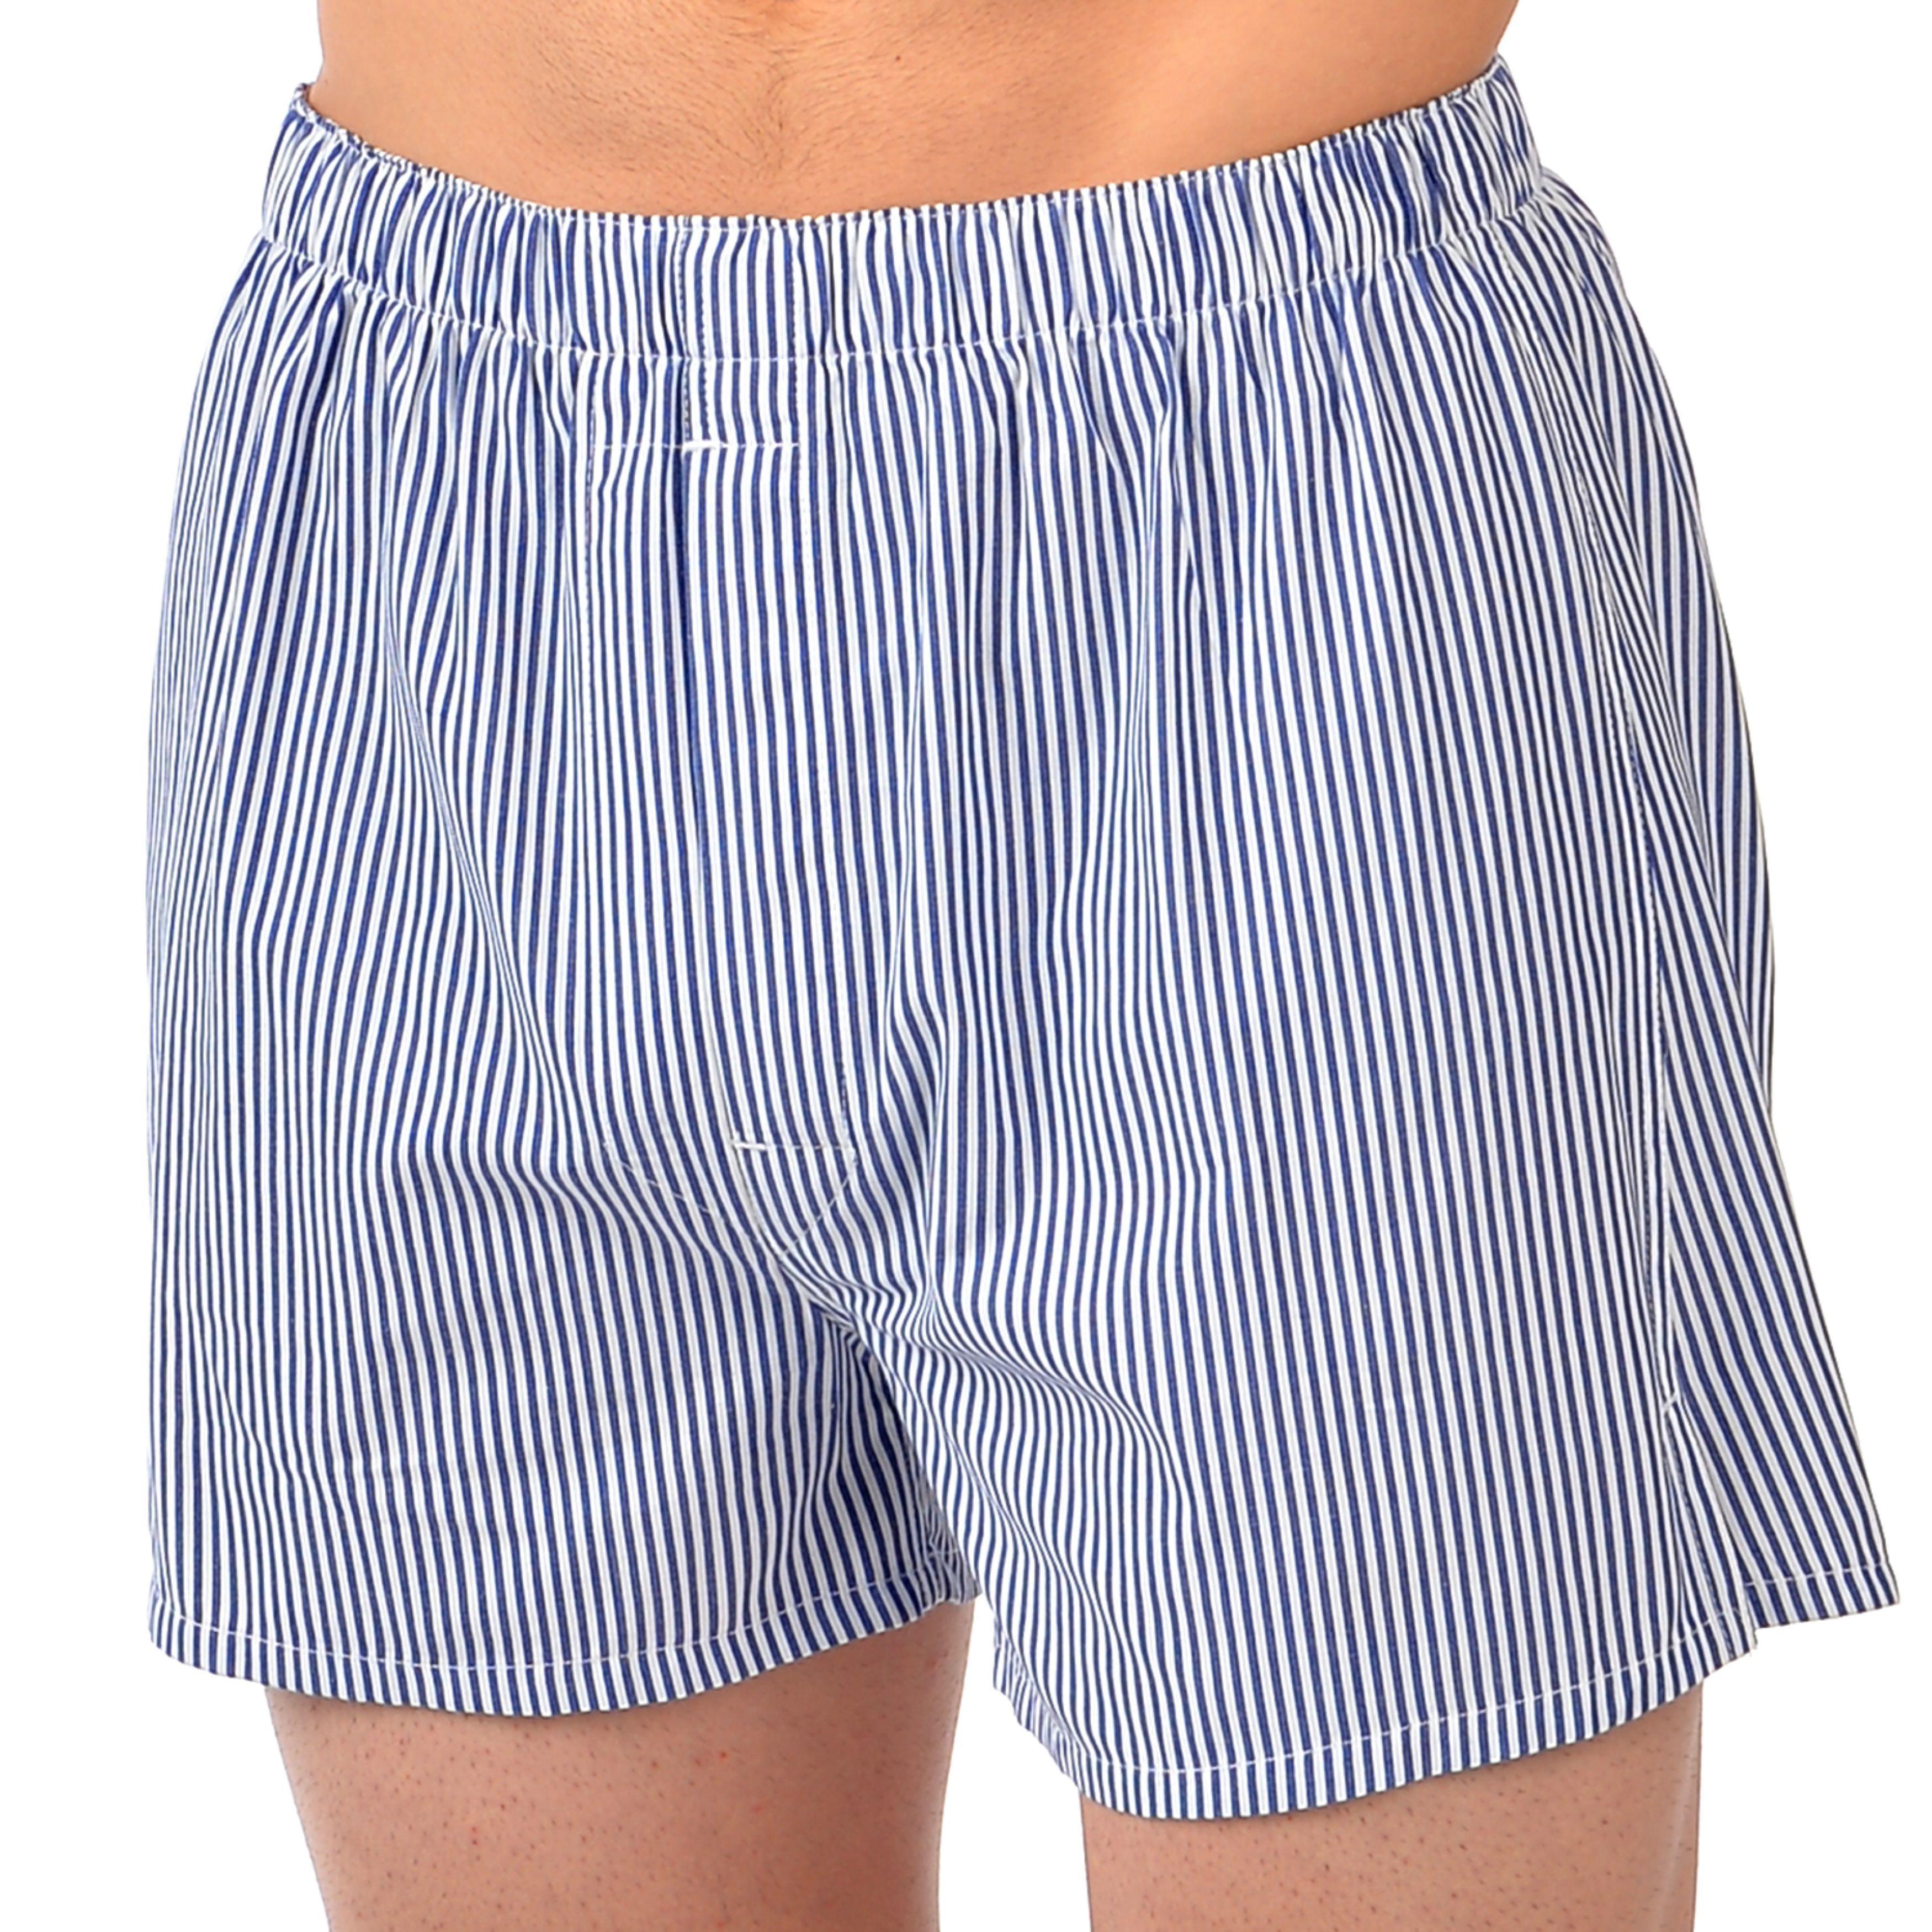 Majestic Men's Basic All-cotton Boxers (Blue&White Stripe...